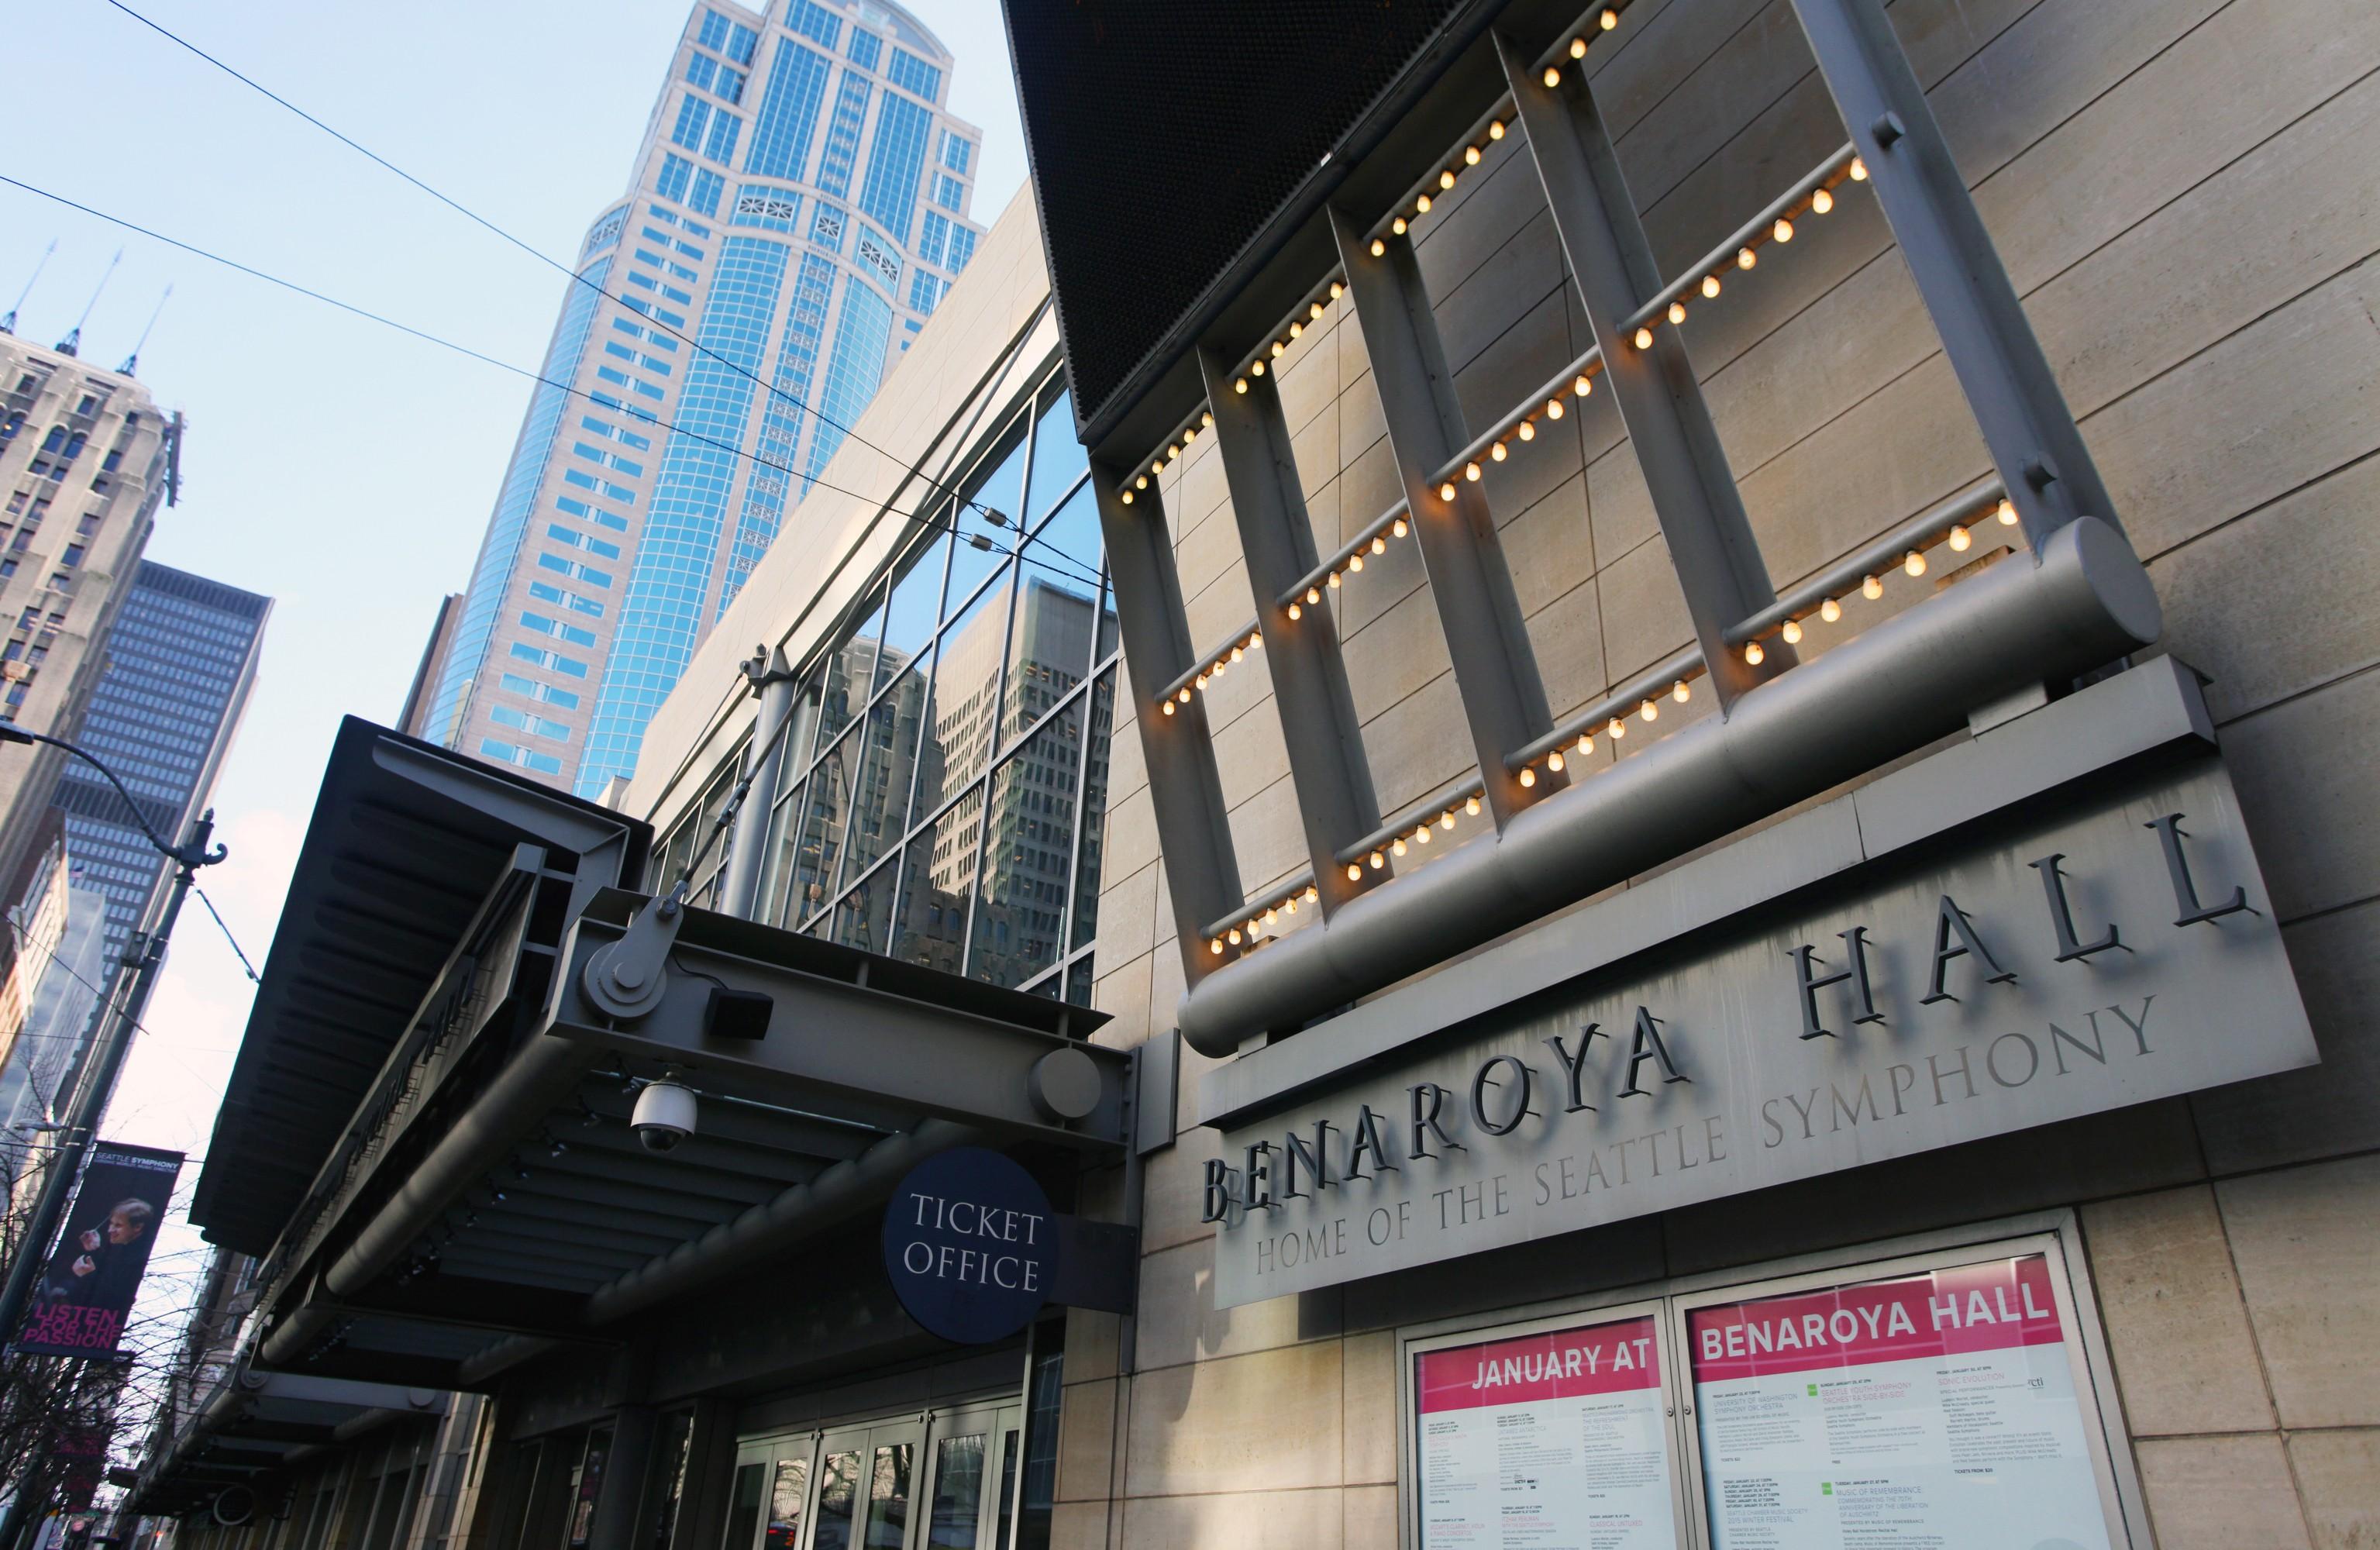 Count Basie Orchestra plays Benaroya Hall, Seattle